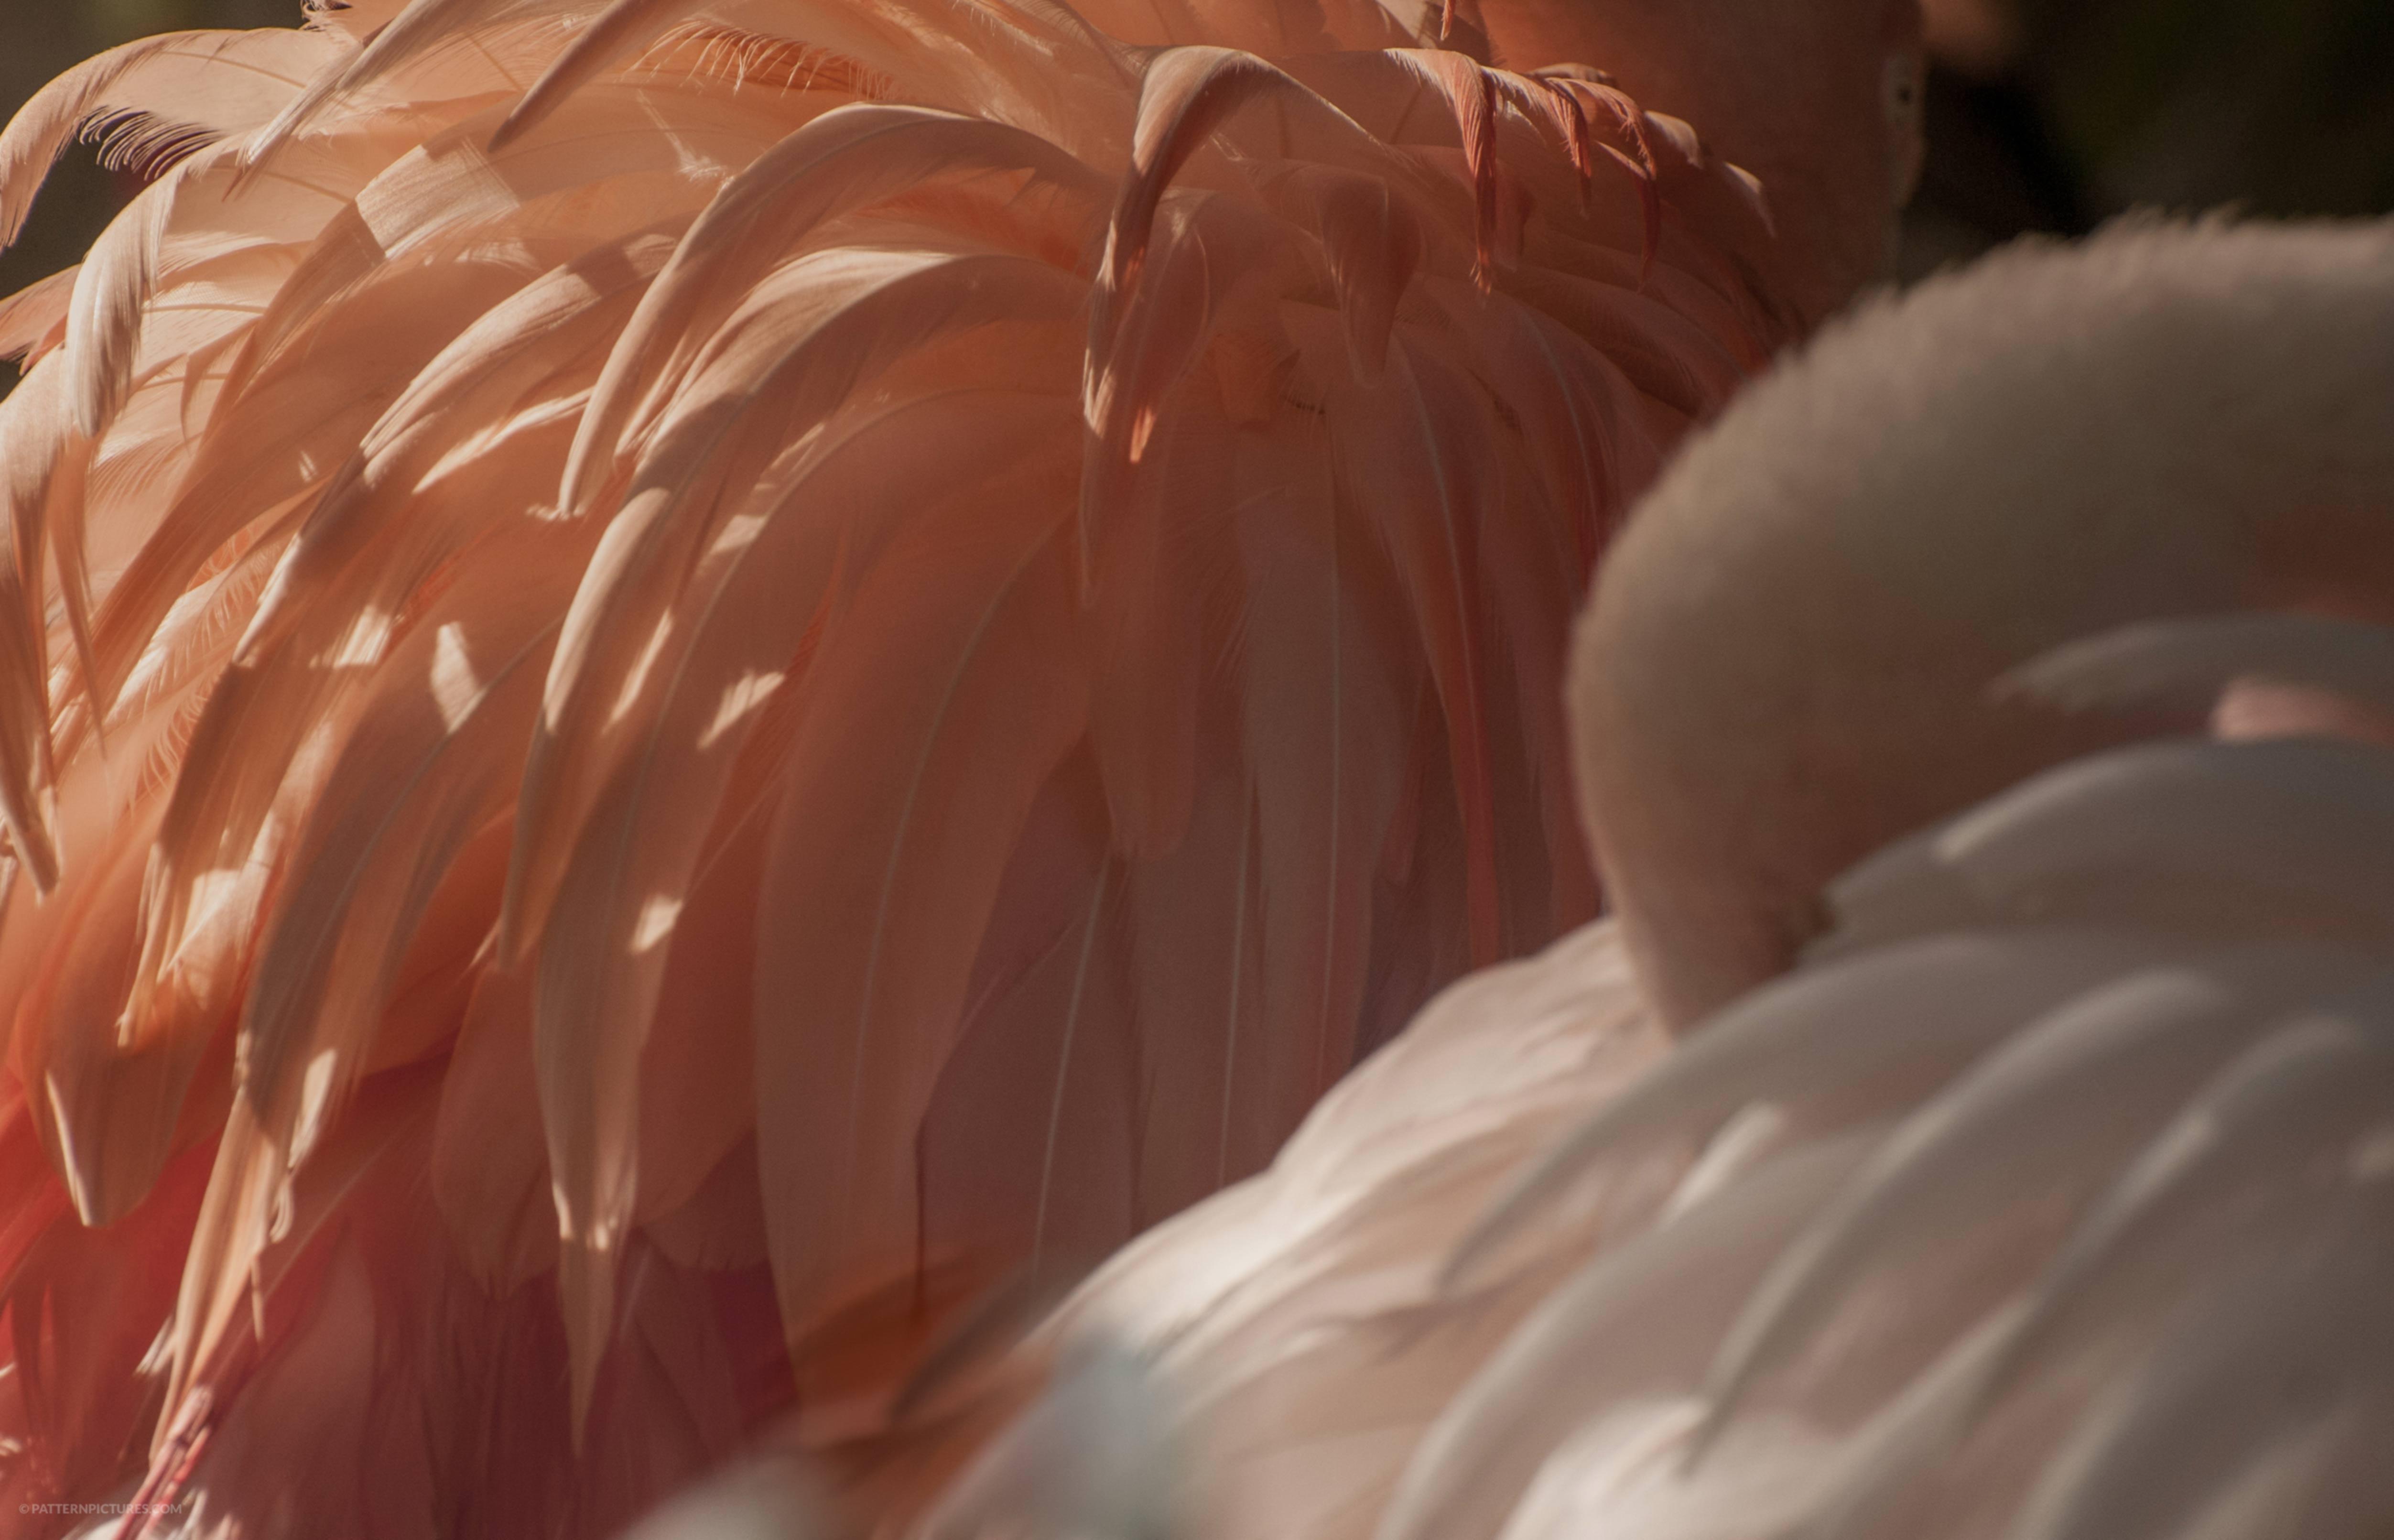 Flamingo hiding